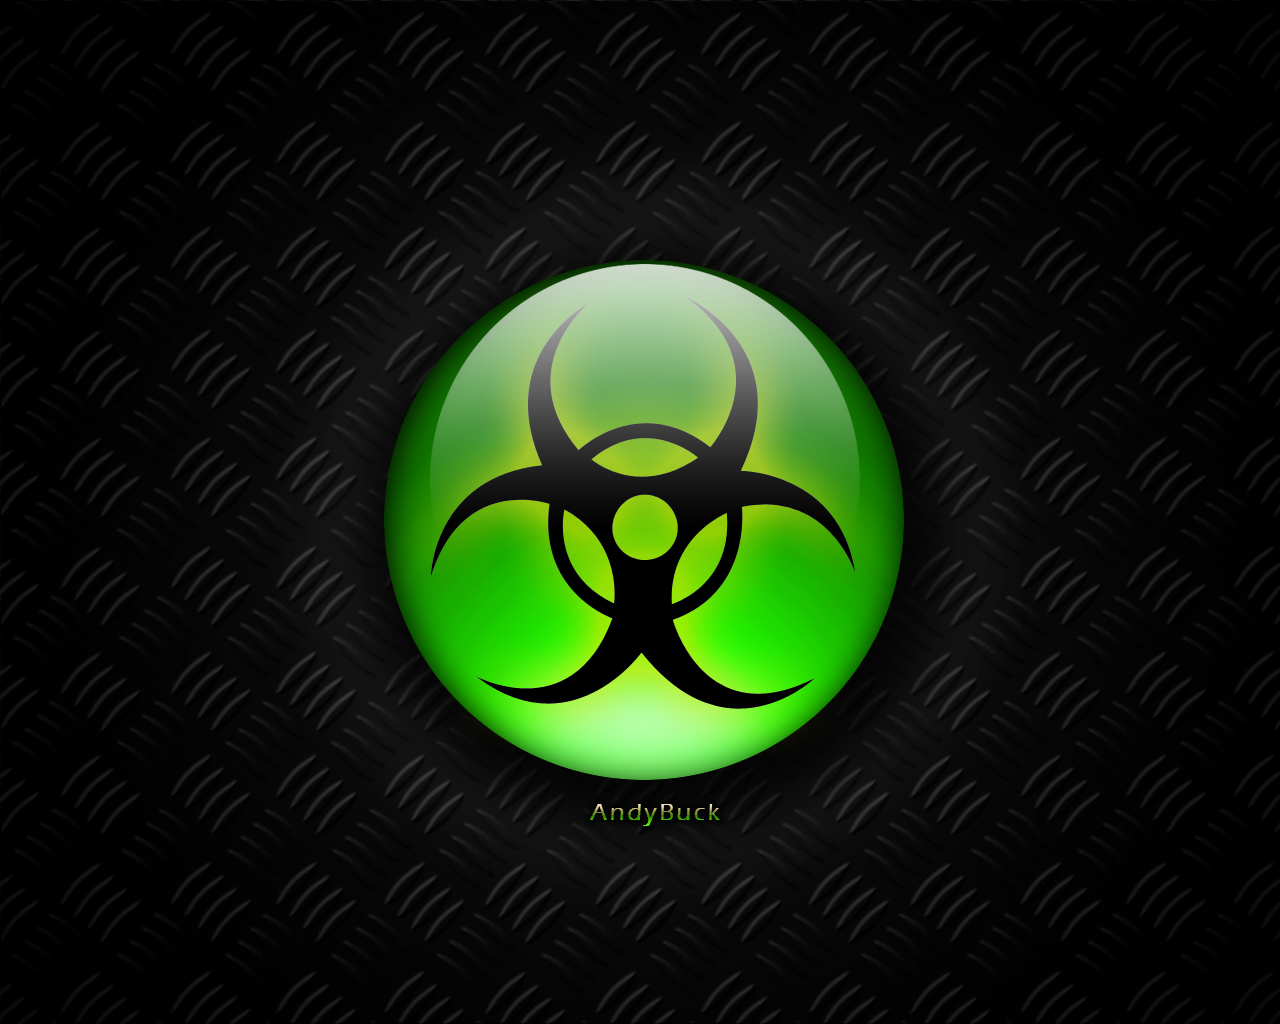 Blue Biohazard Wallpaper - WallpaperSafari